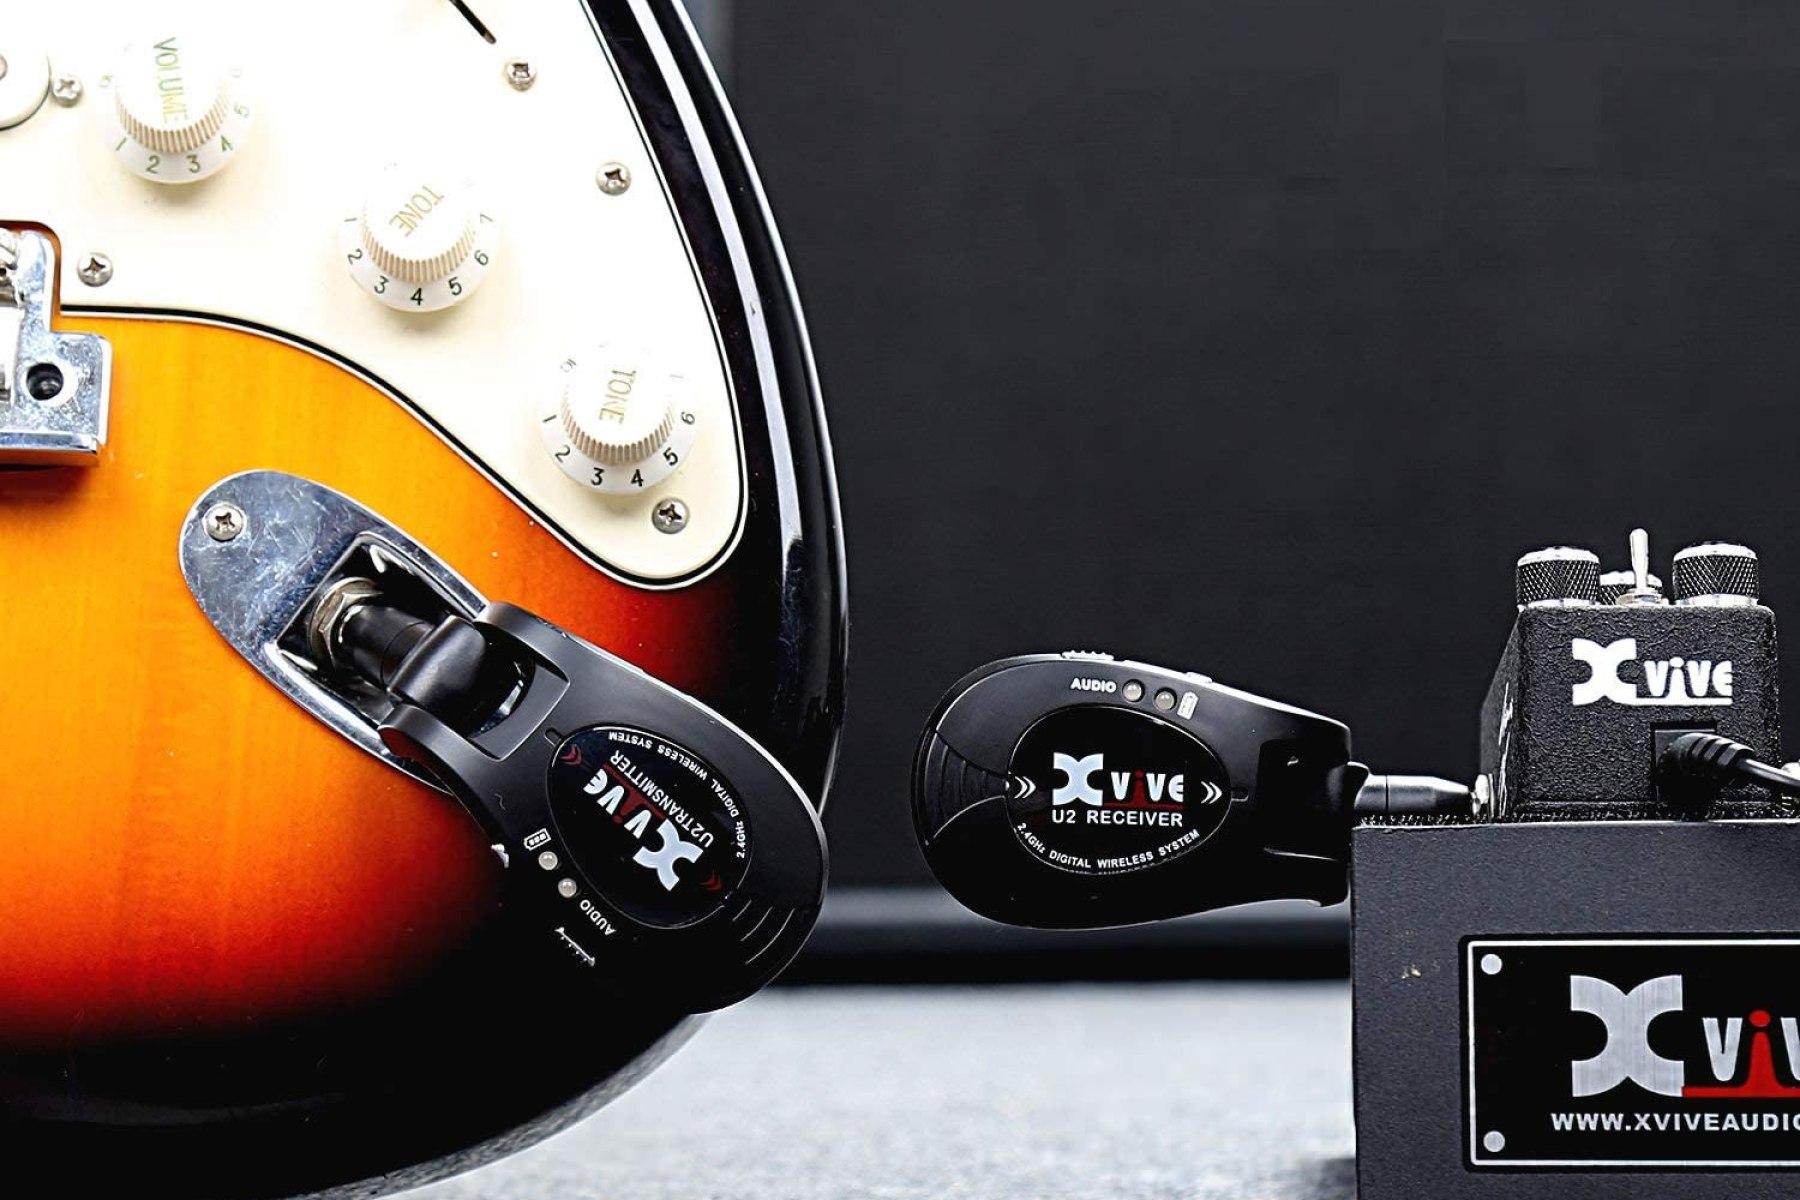 LEKATO 5.8G Wireless Guitar System Wireless Audio Electric Guitar Transmitter 4